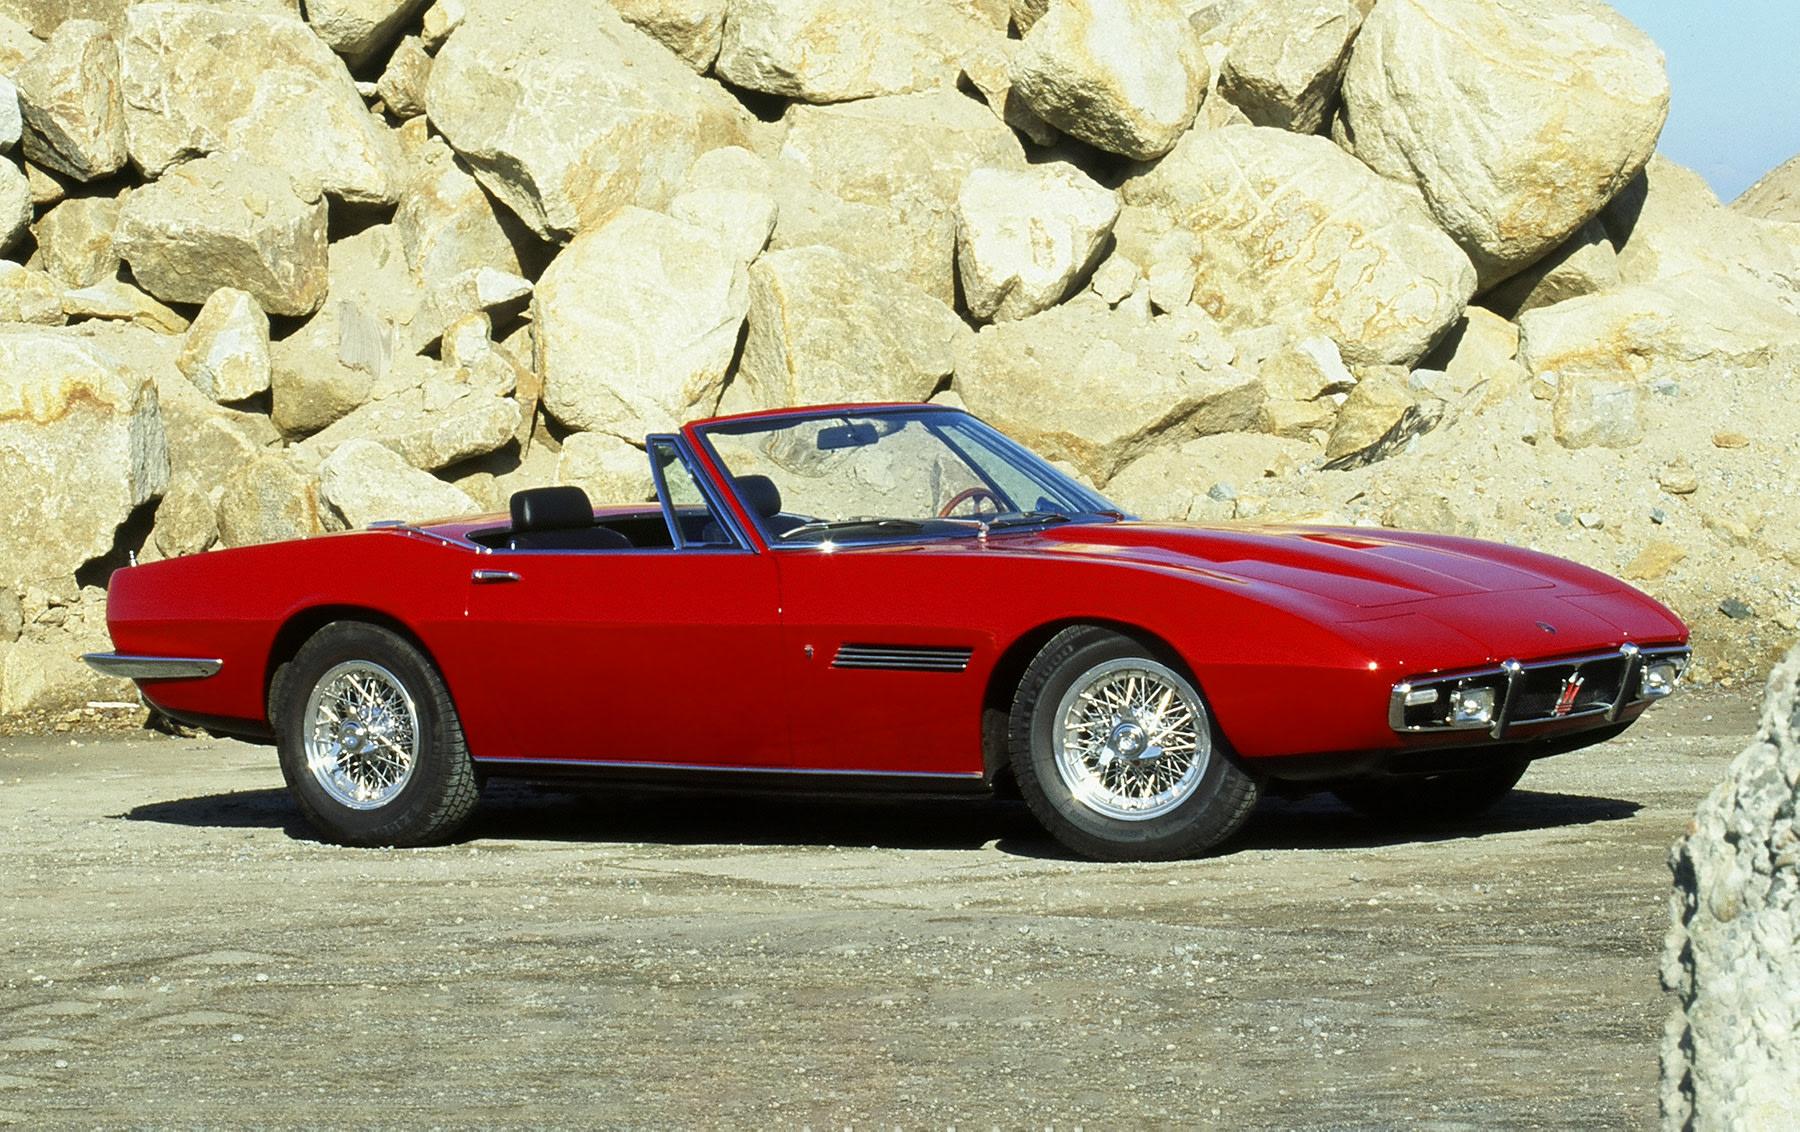 1969 Maserati Ghibli 4.9 SS Spider